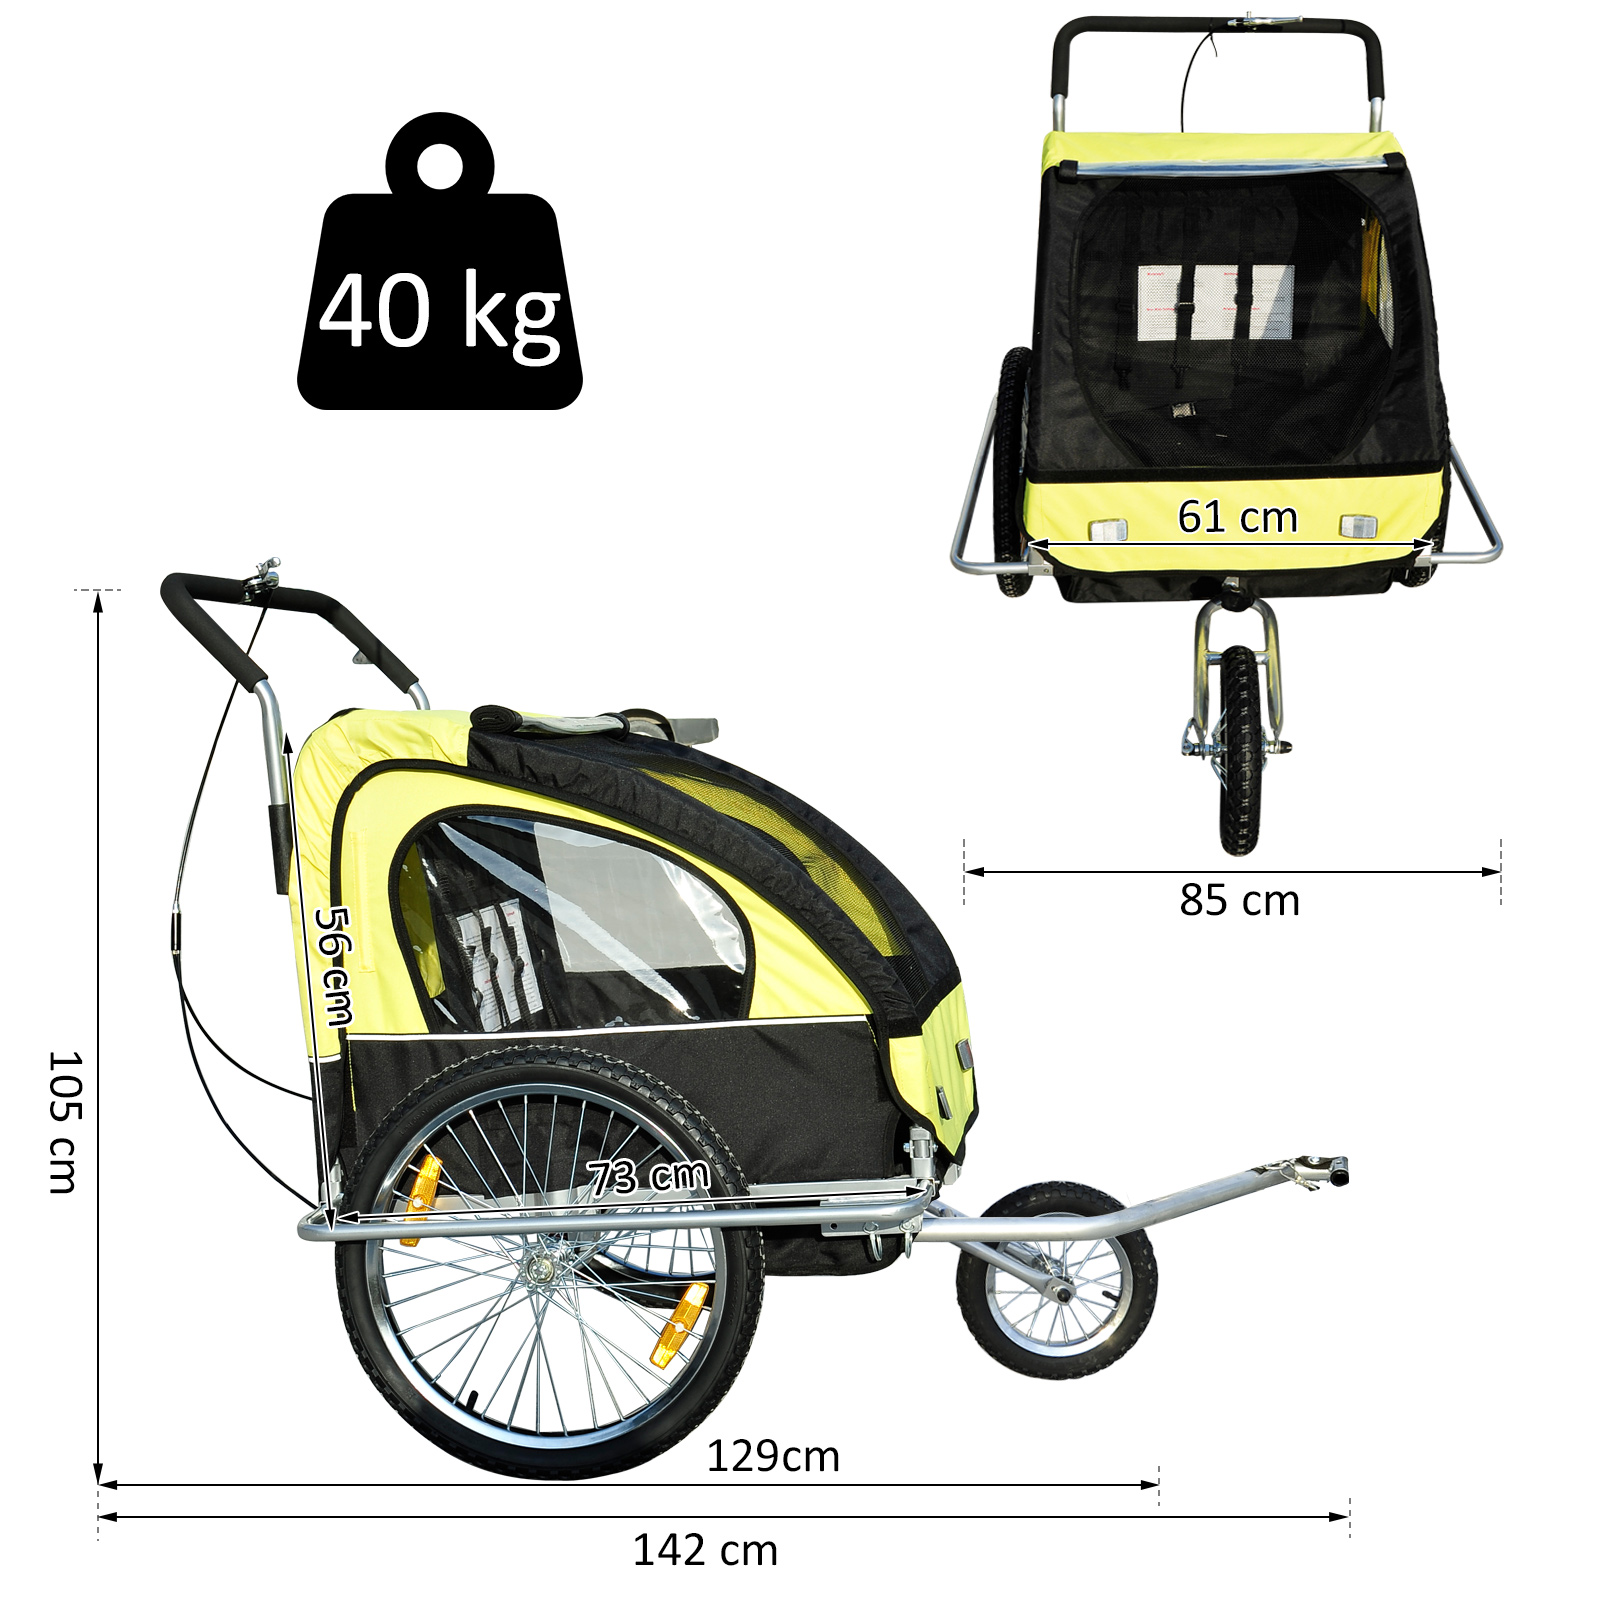 Remolque-Bicicleta-Nino-2-PLAZAS-Amortiguador-Kit-Footing-Freno-Bandera-Cubierta miniatura 10